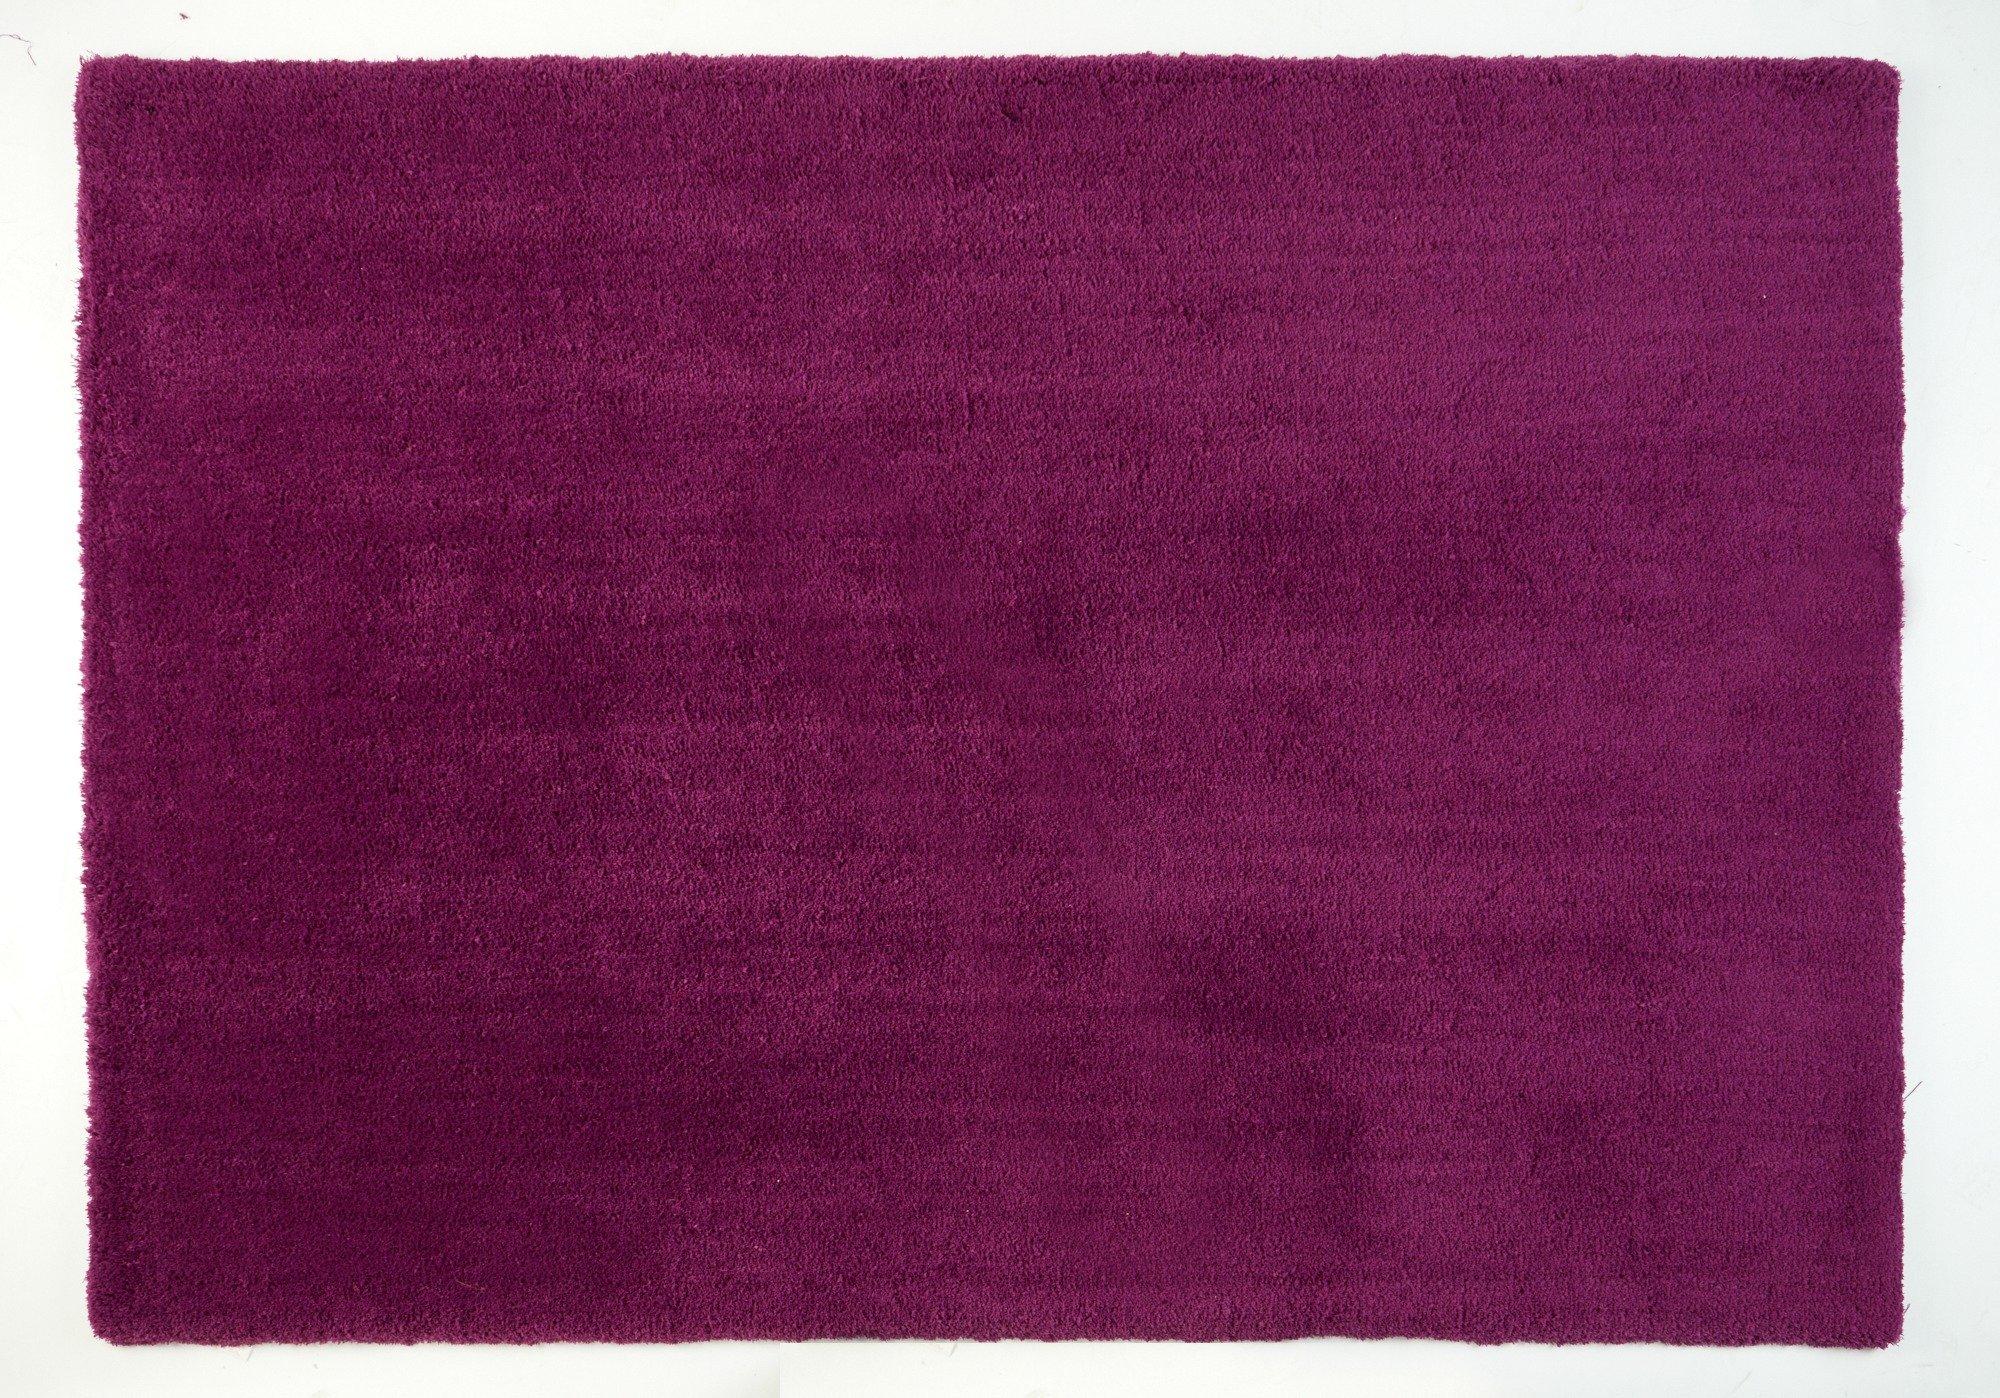 ColourMatch Snuggle Shaggy Rug - 110x170cm - Grape